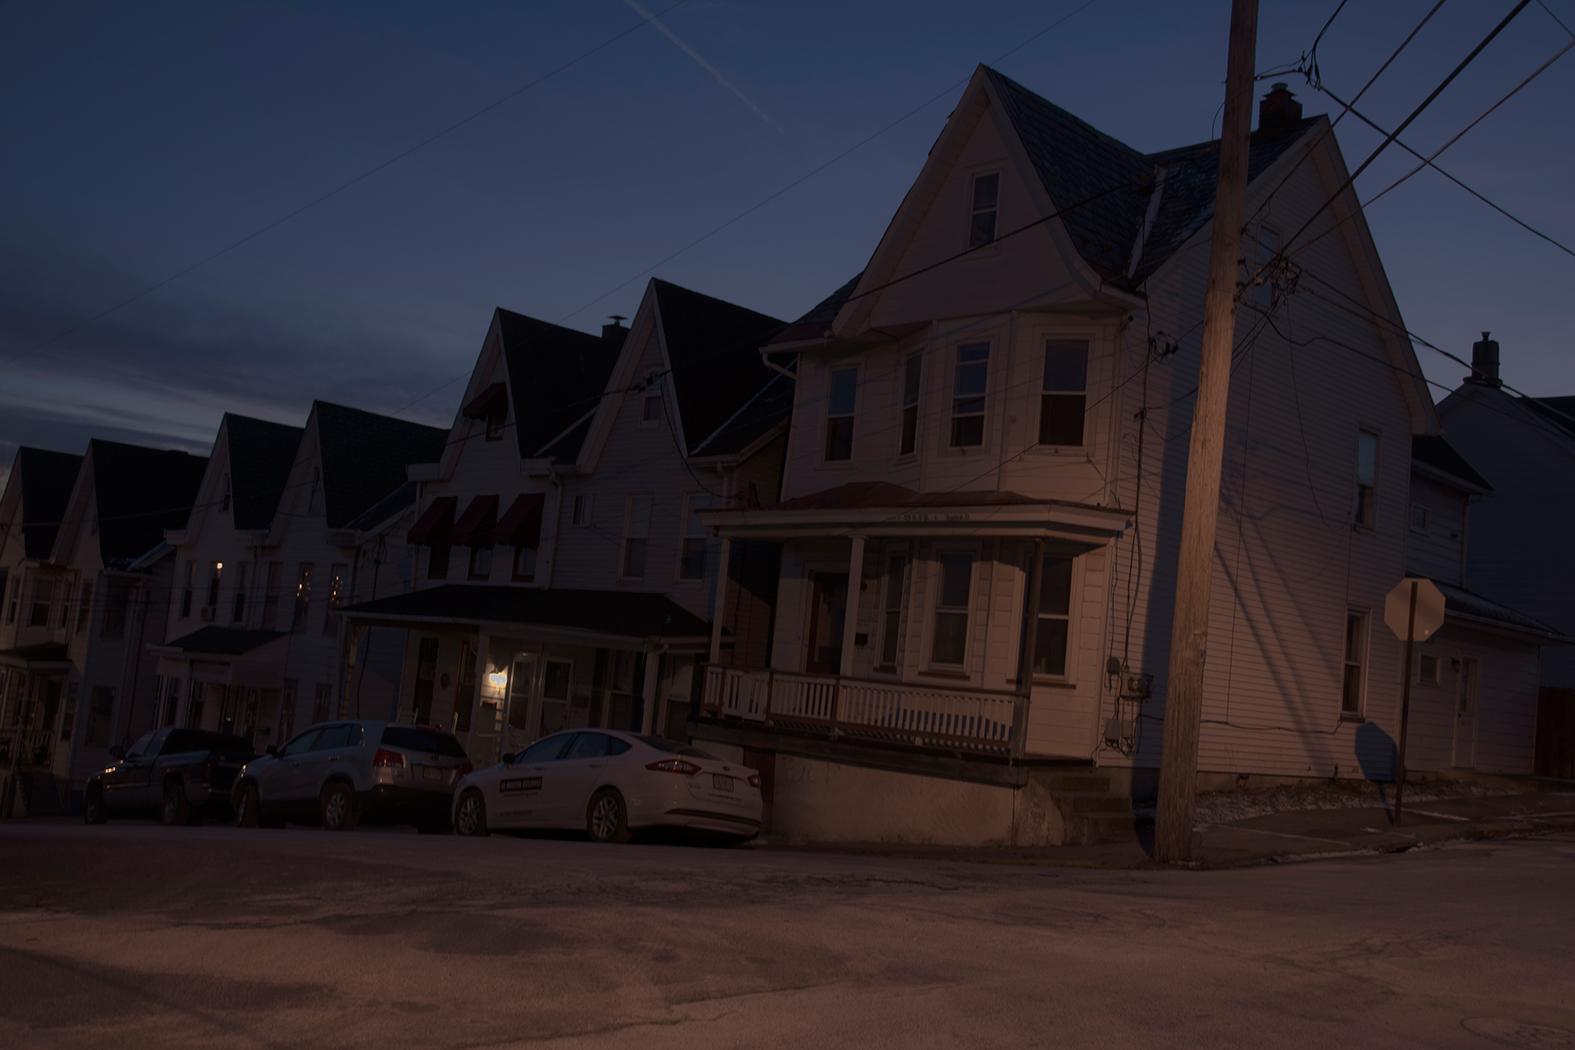 dark,photo noir,photo,noir,urban,night,long exposure